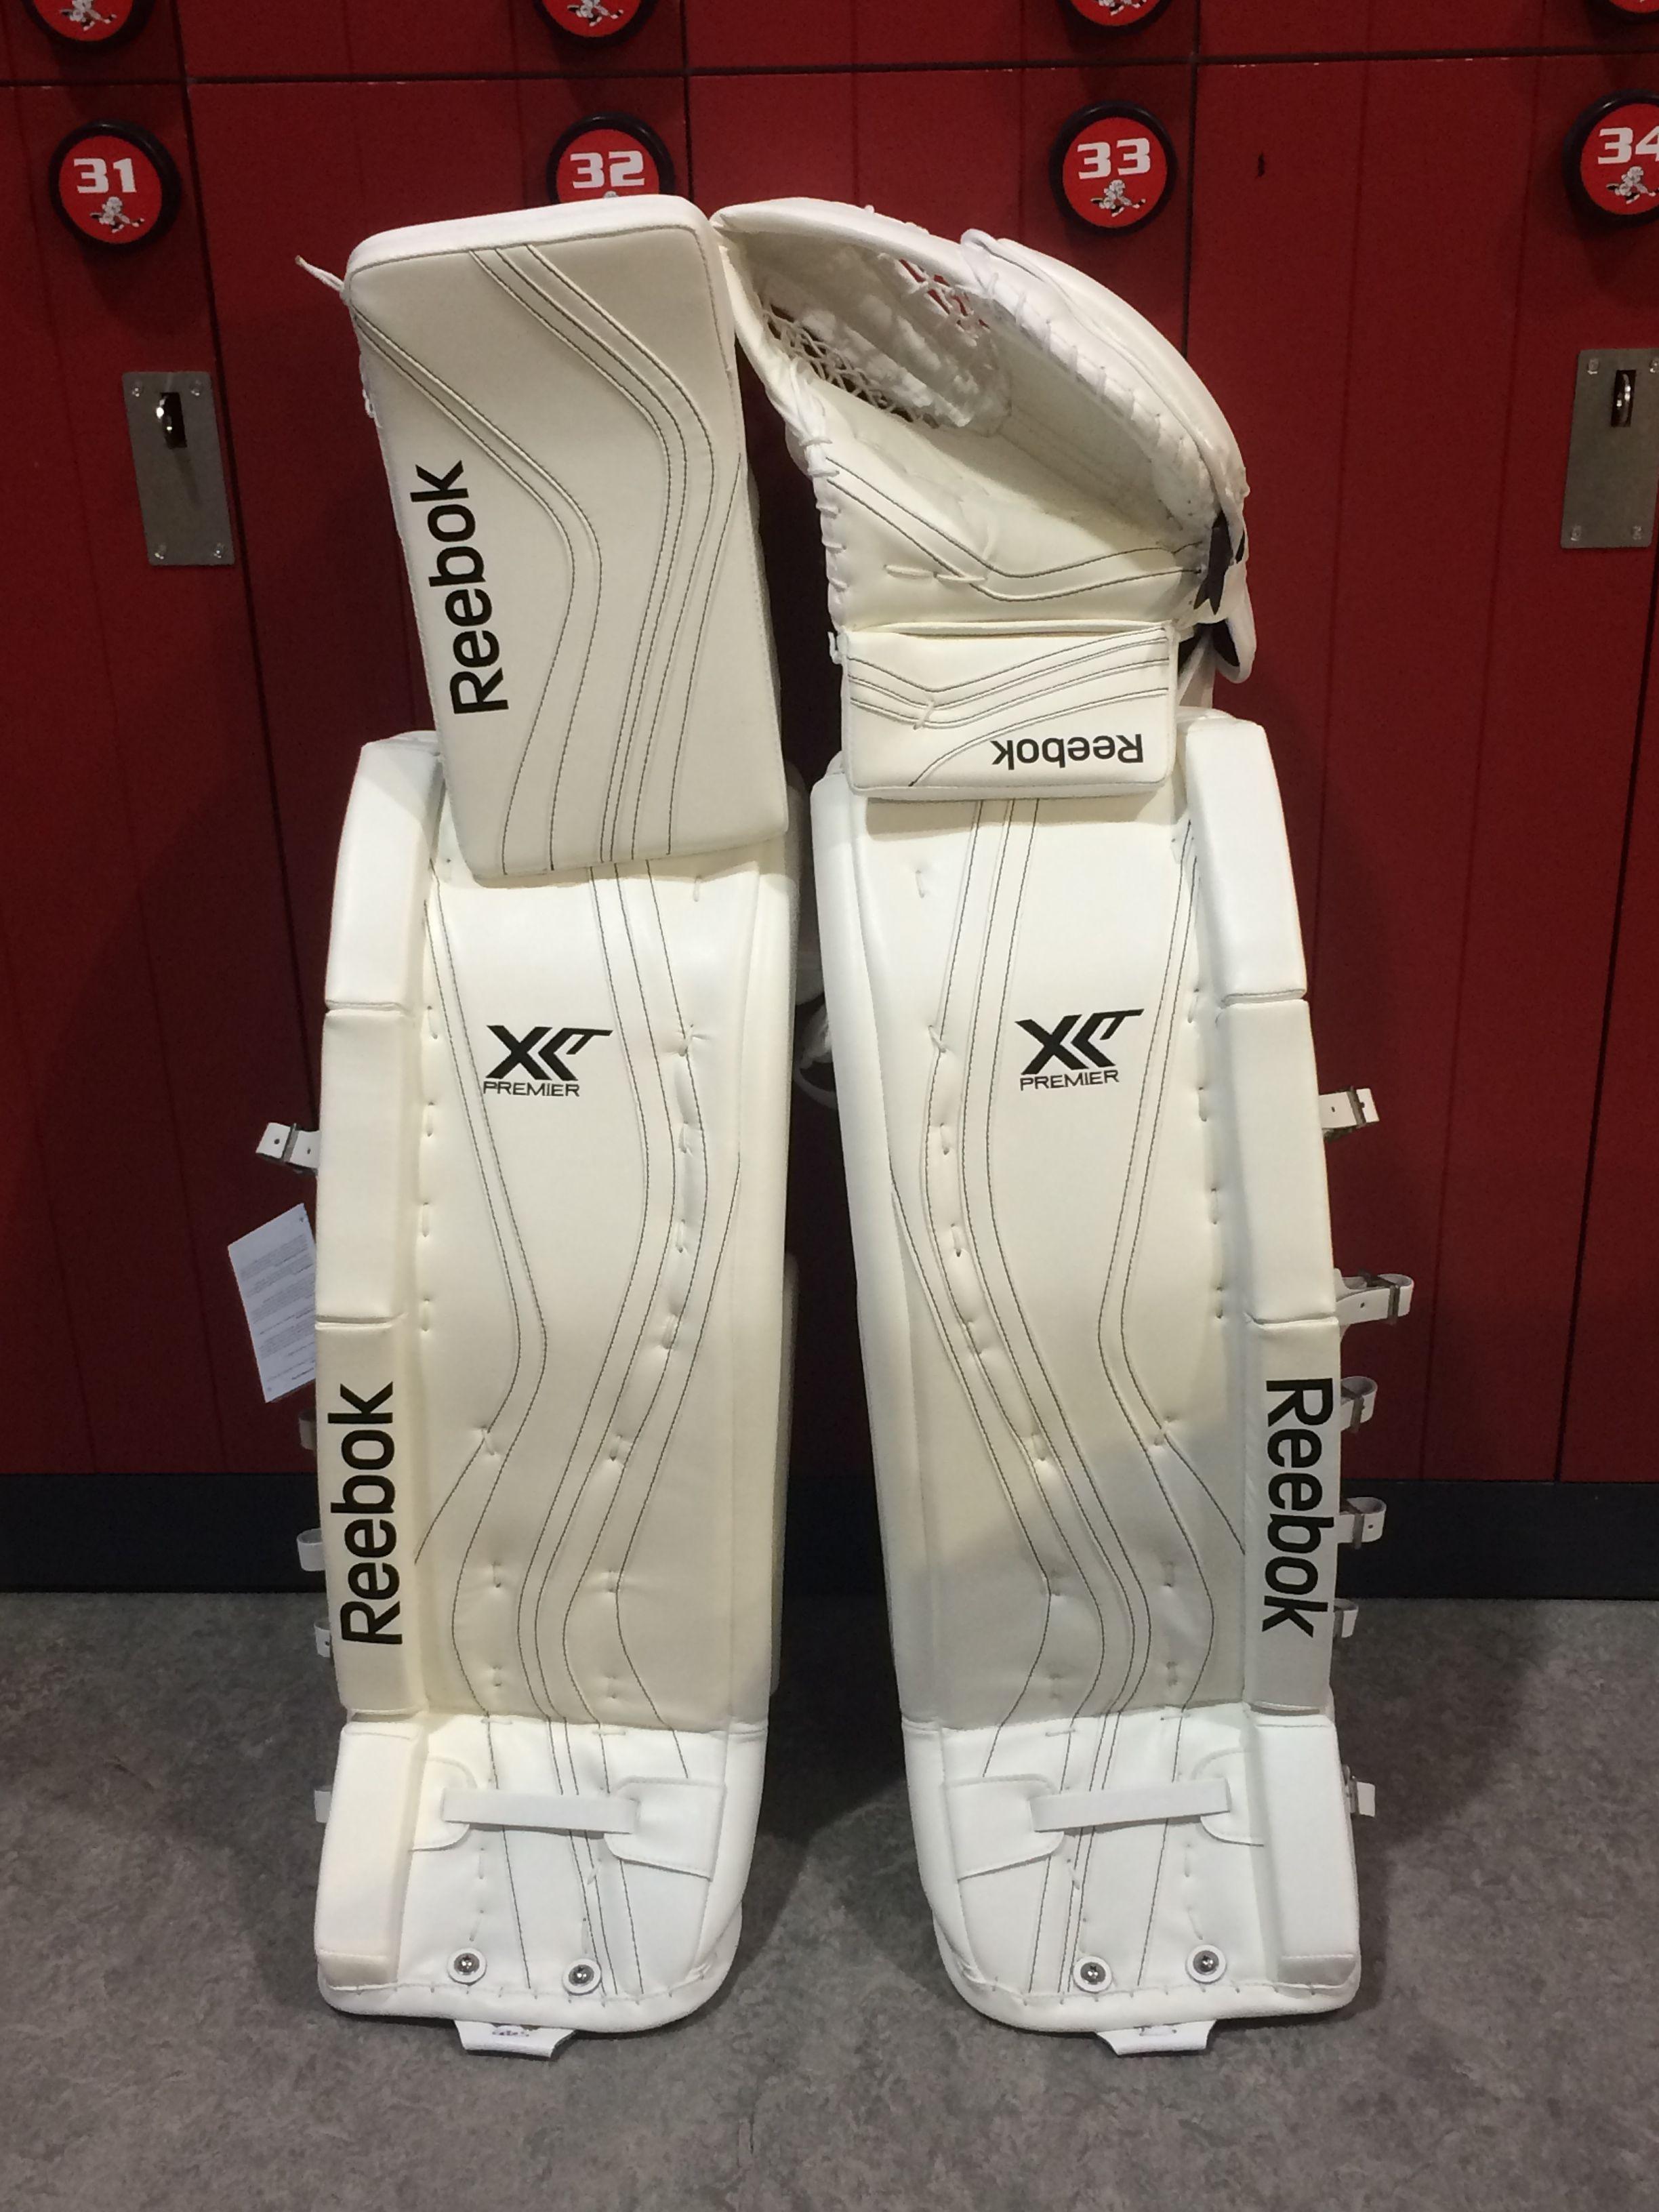 Reebok Premier XLT Pro custom goalie pads and gloves made for a